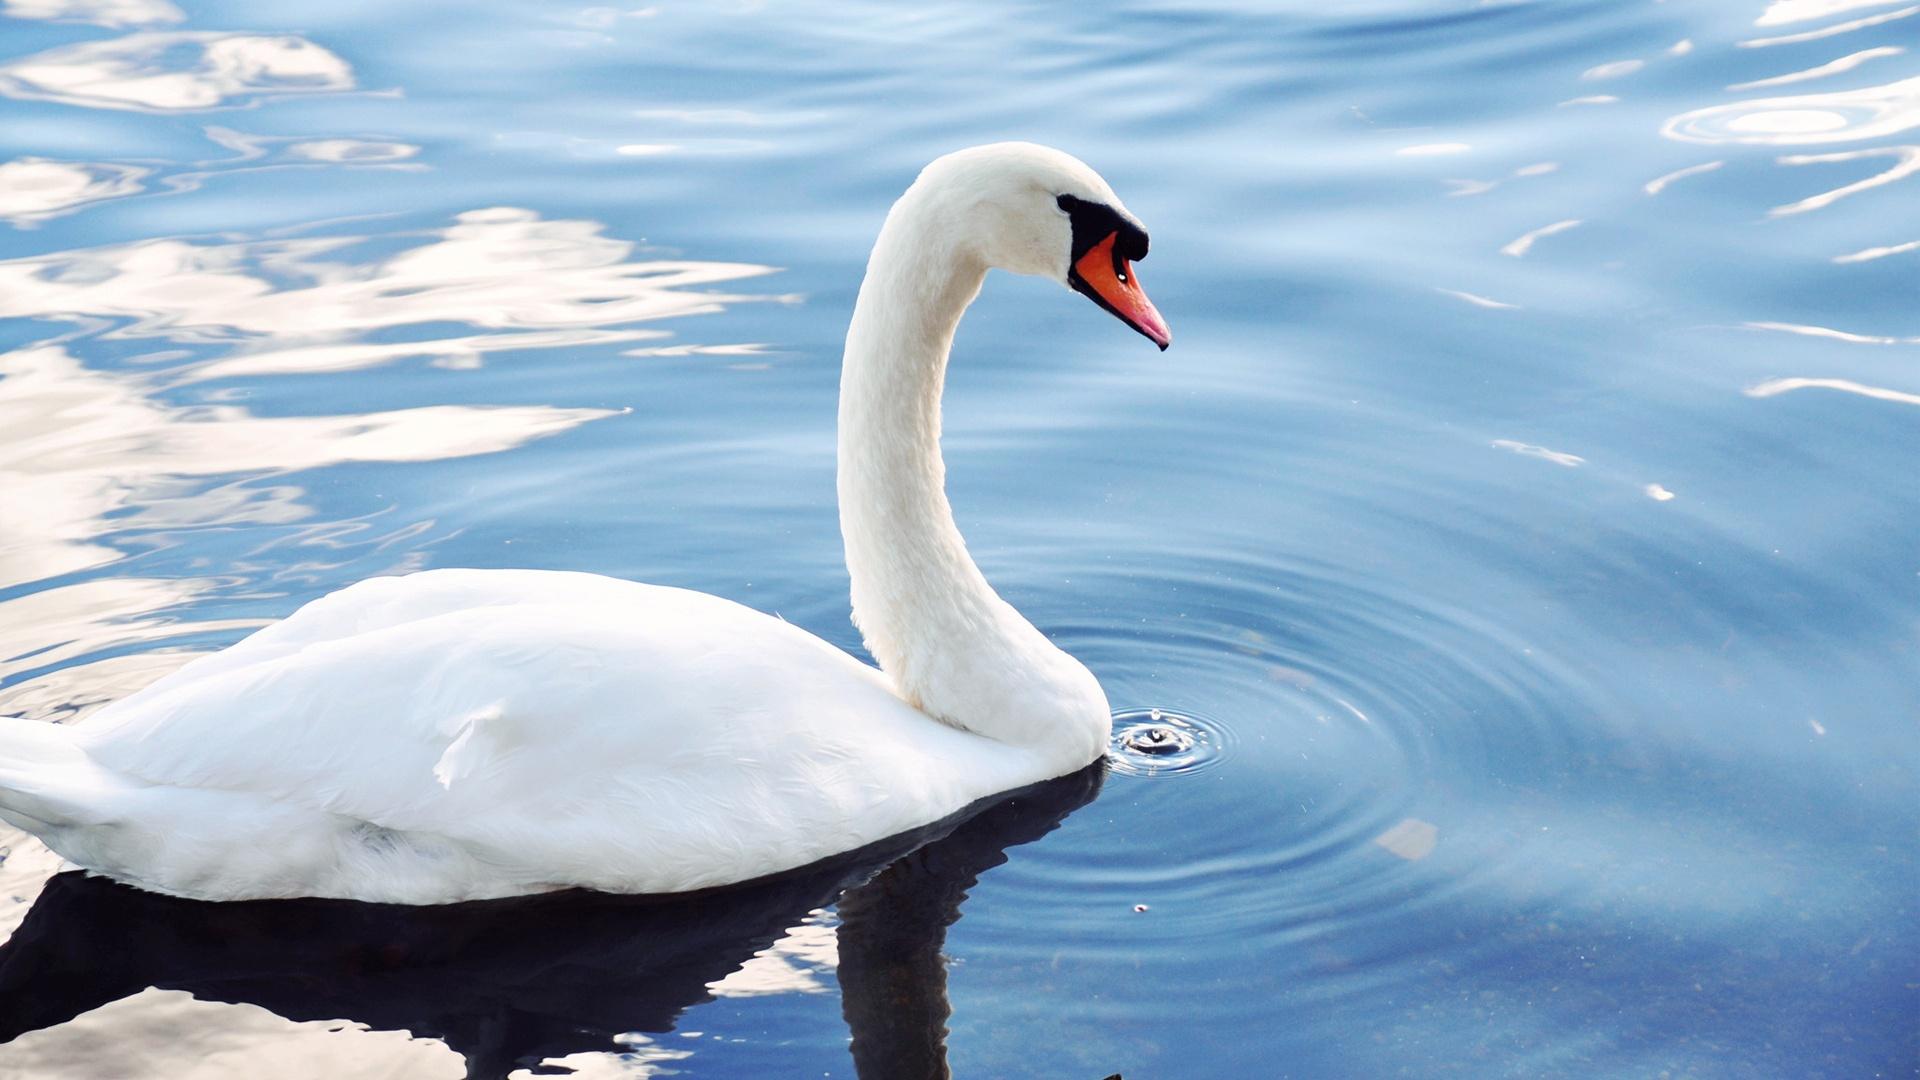 Awesome White Swan Bird